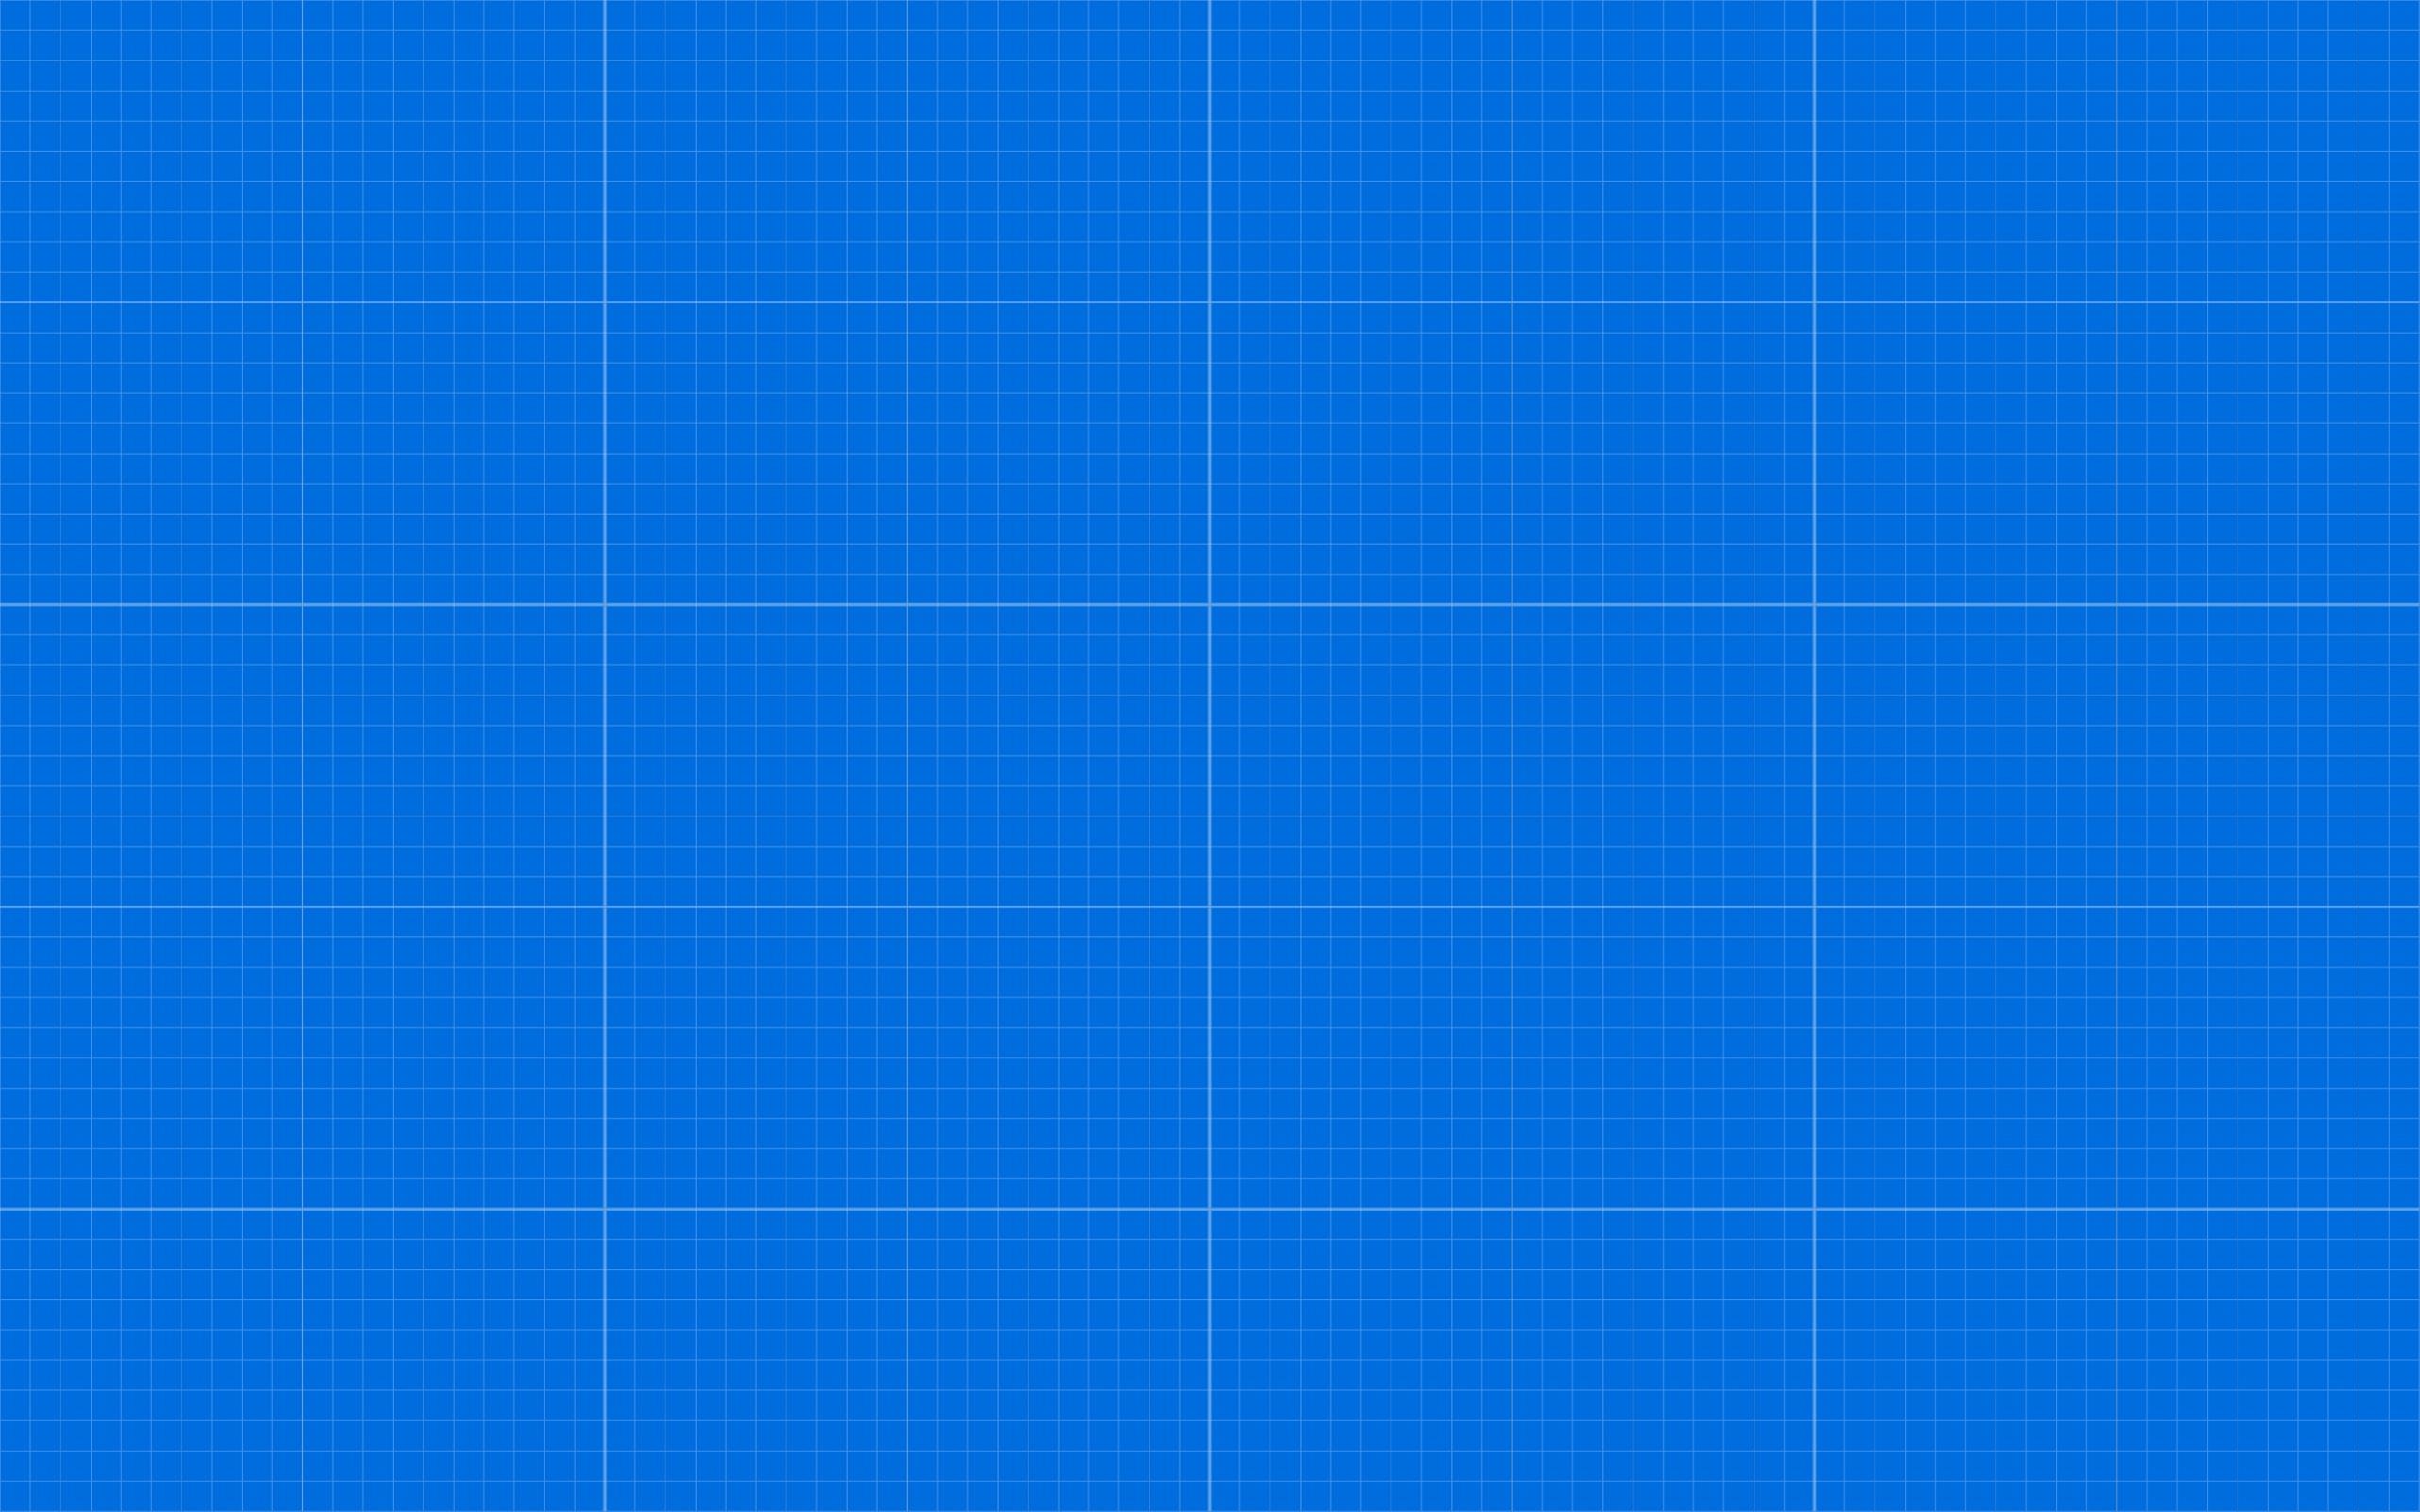 Free Grid Wallpaper 22614 1920x1200 px